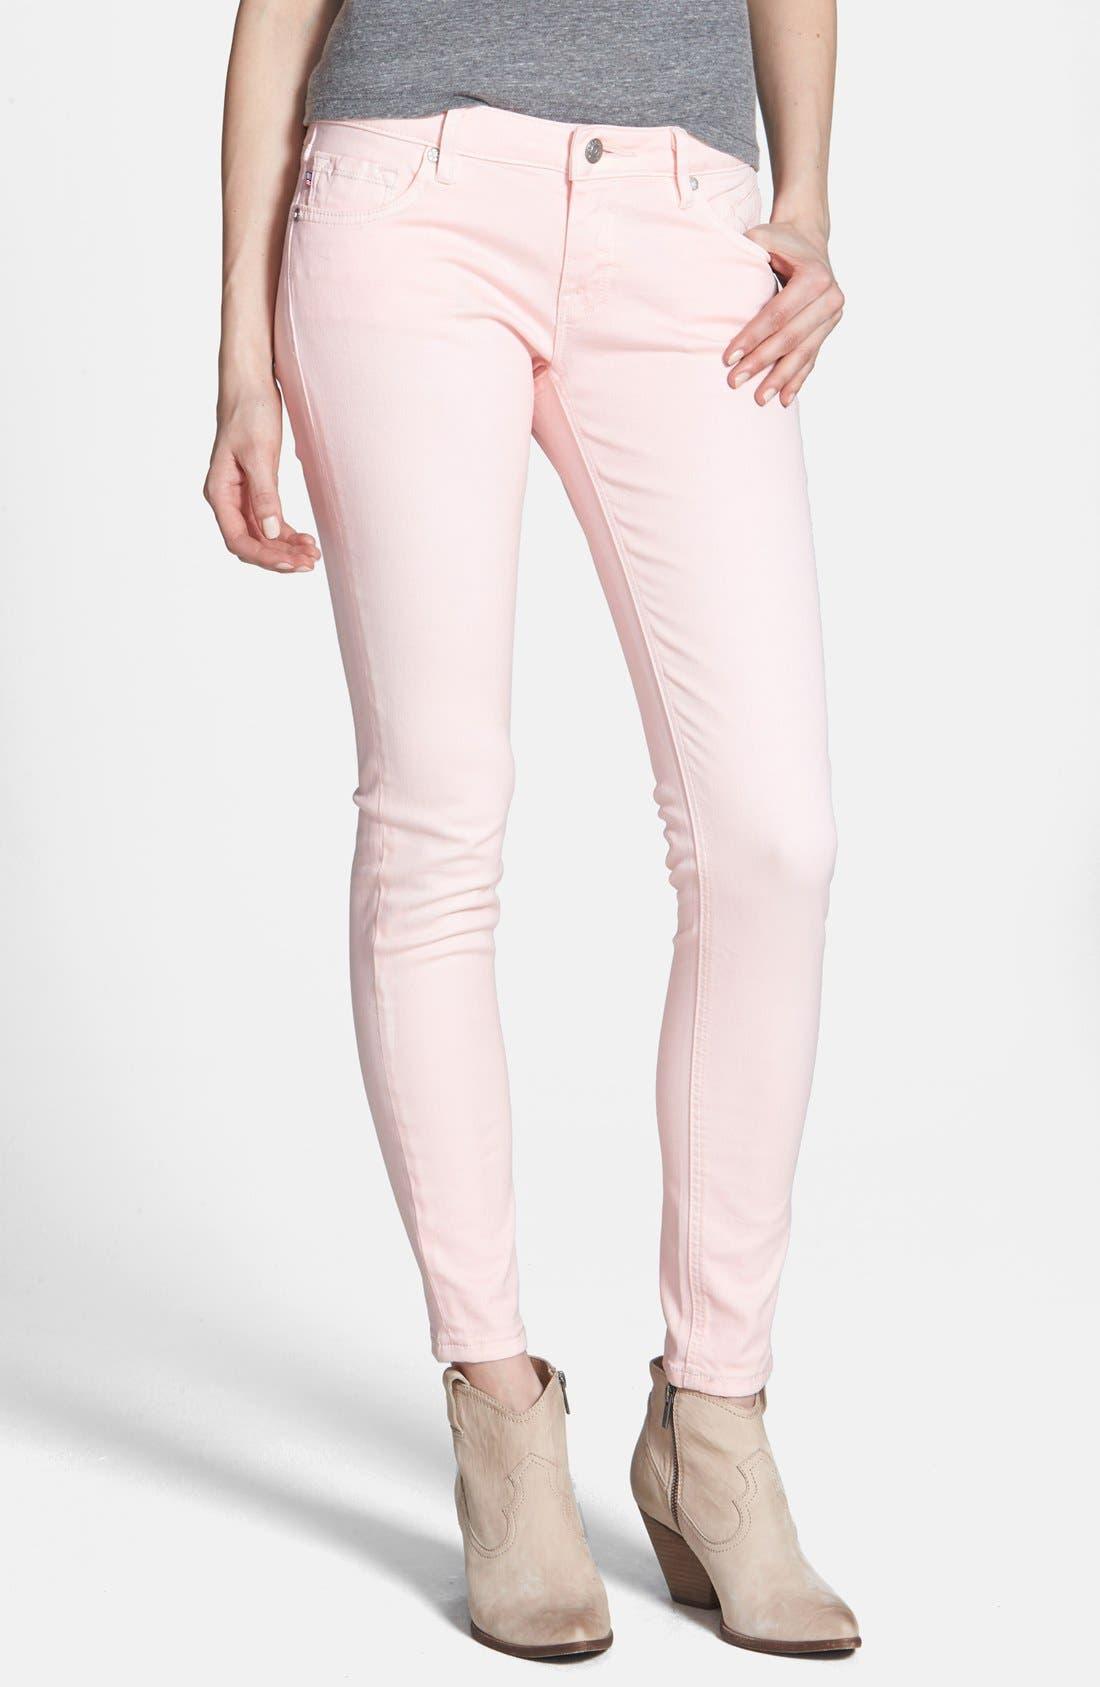 Main Image - Vigoss Skinny Ankle Jeans (Light Pink) (Juniors) (Online Only)